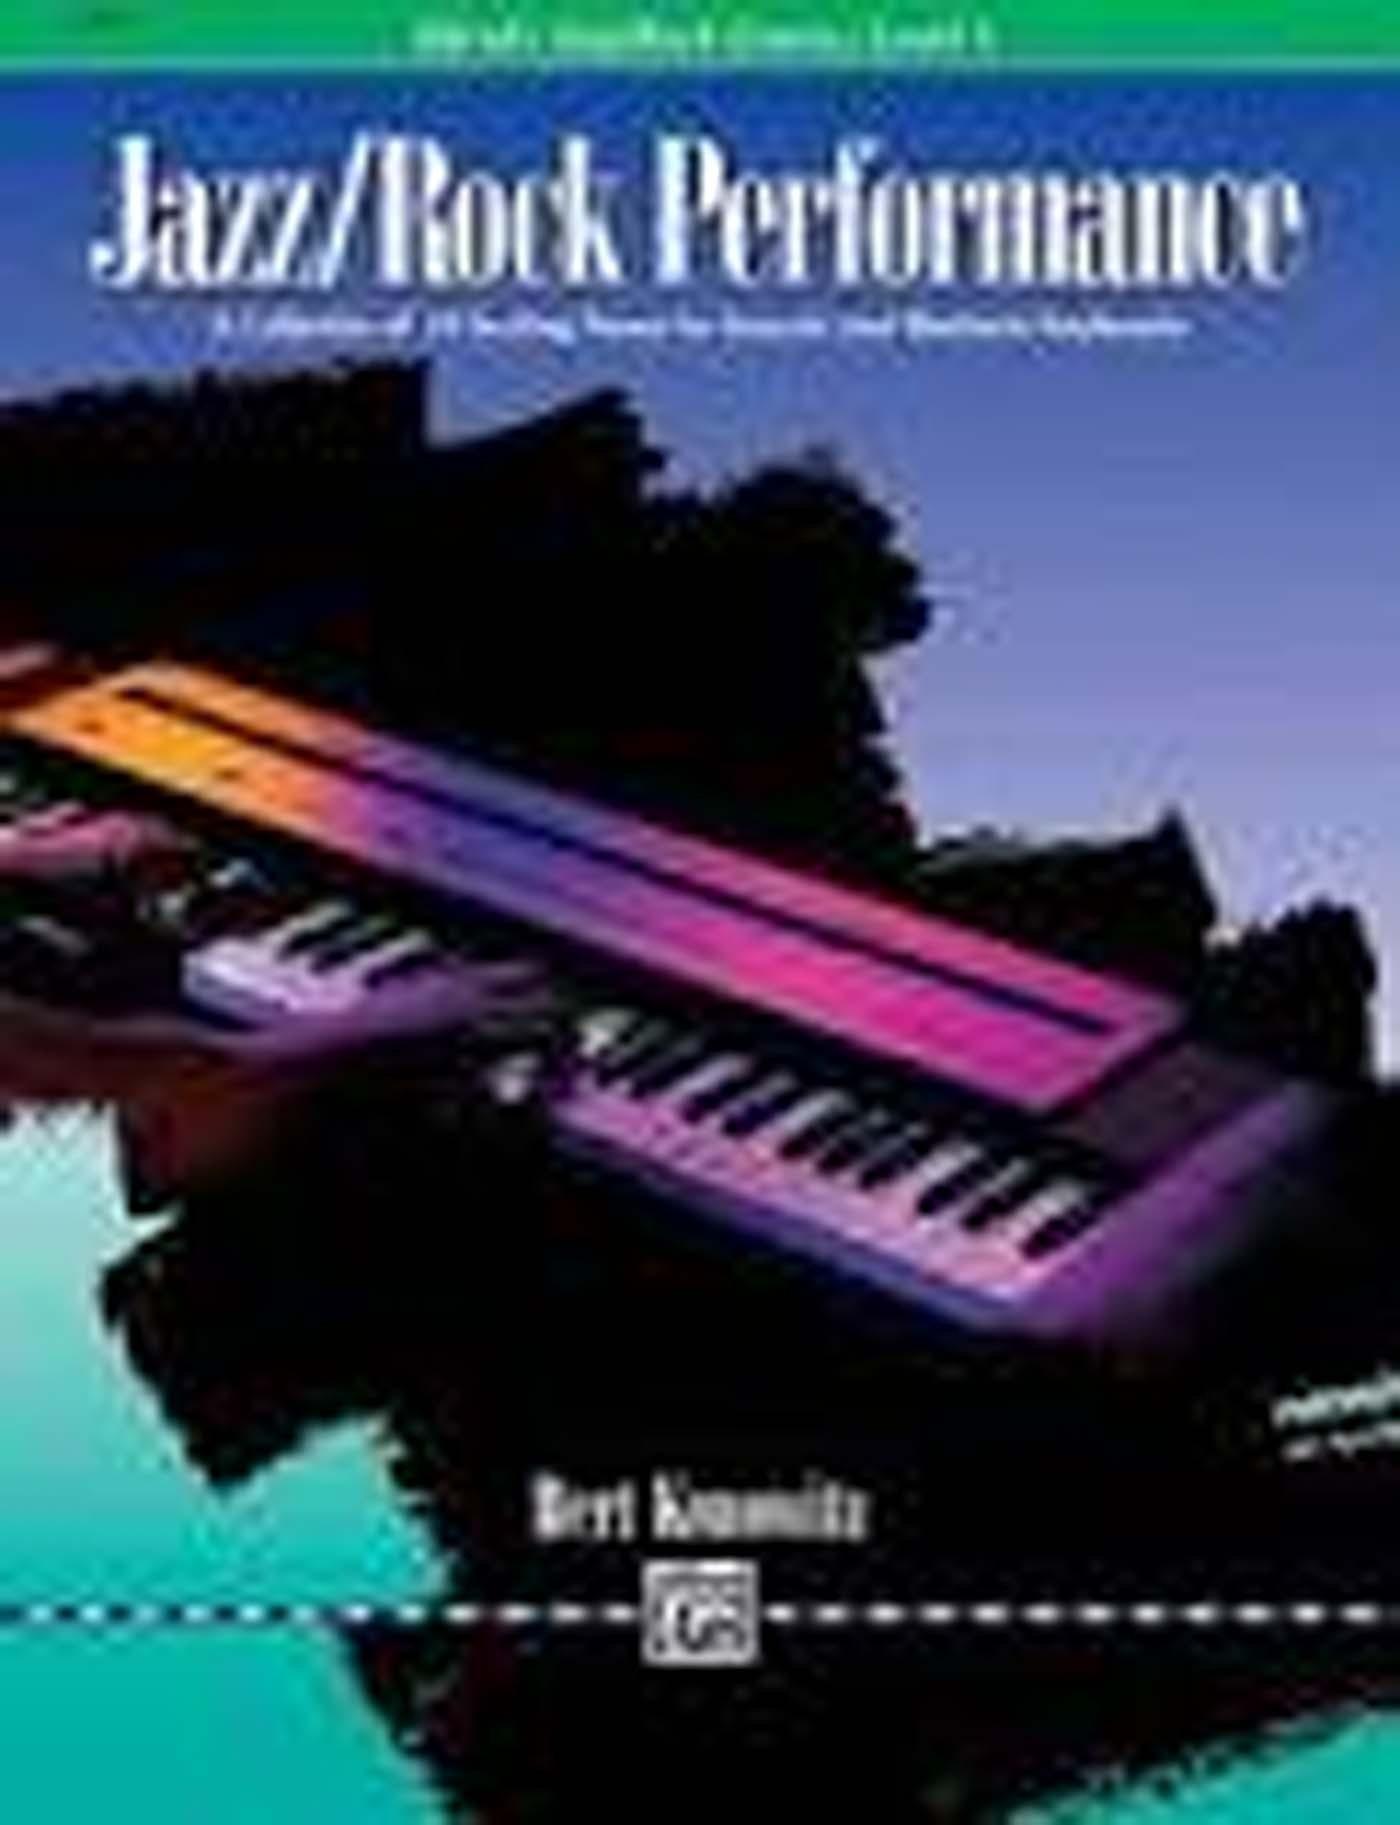 Alfred's Basic Piano Library Level 1 Book Jazz / Rock Performance Konowitz S98